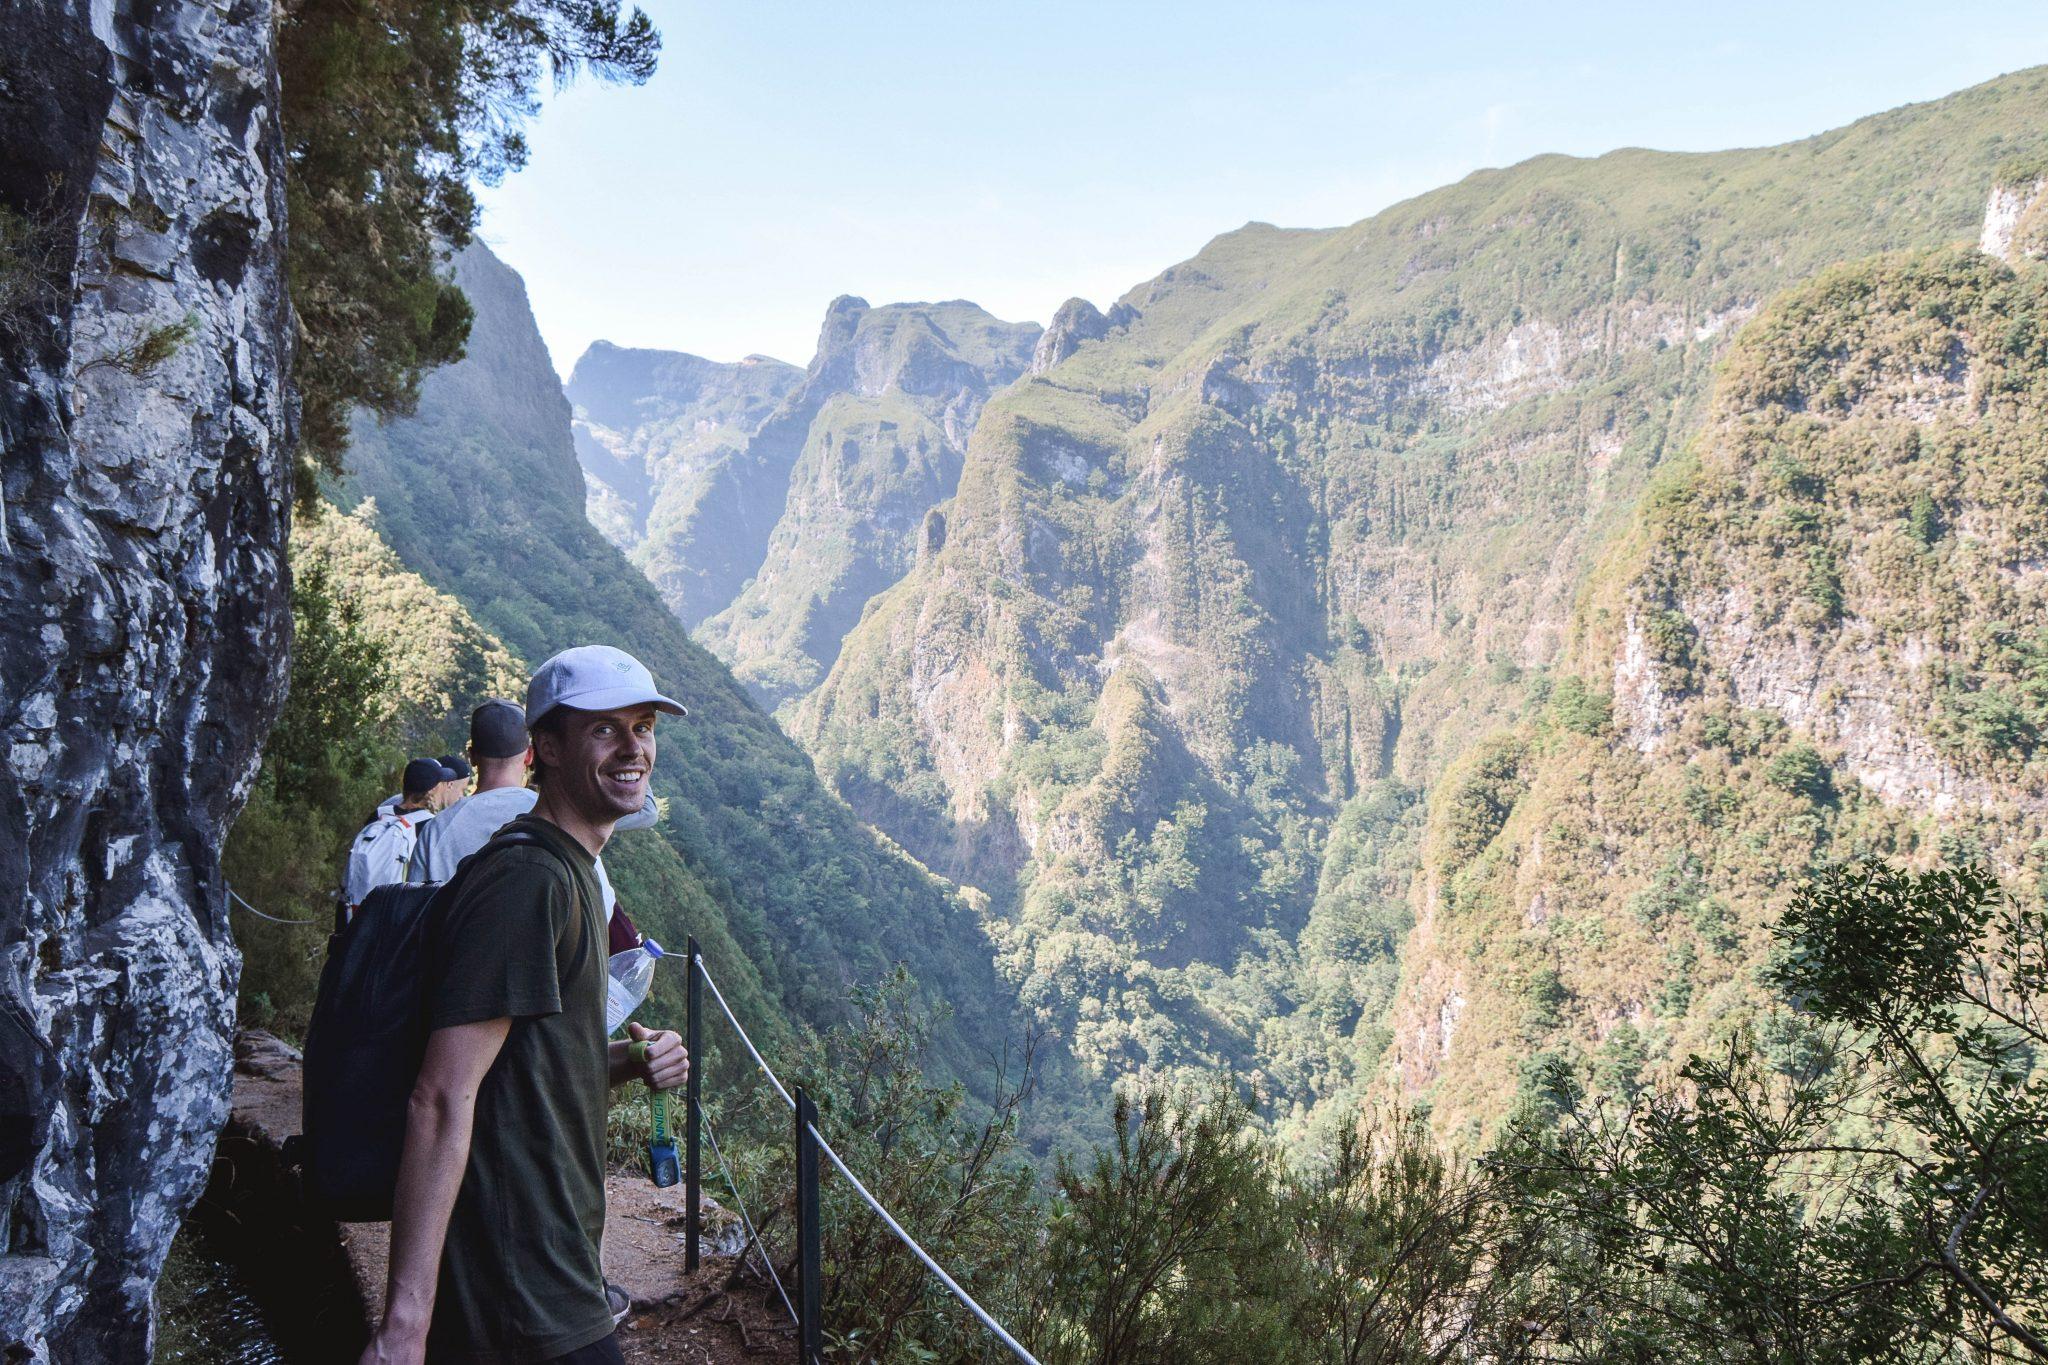 Wanderers & Warriors - Charlie & Lauren UK Travel Couple - Things To Do In Madeira Things To Do - caldeirao verde madeira levada walks